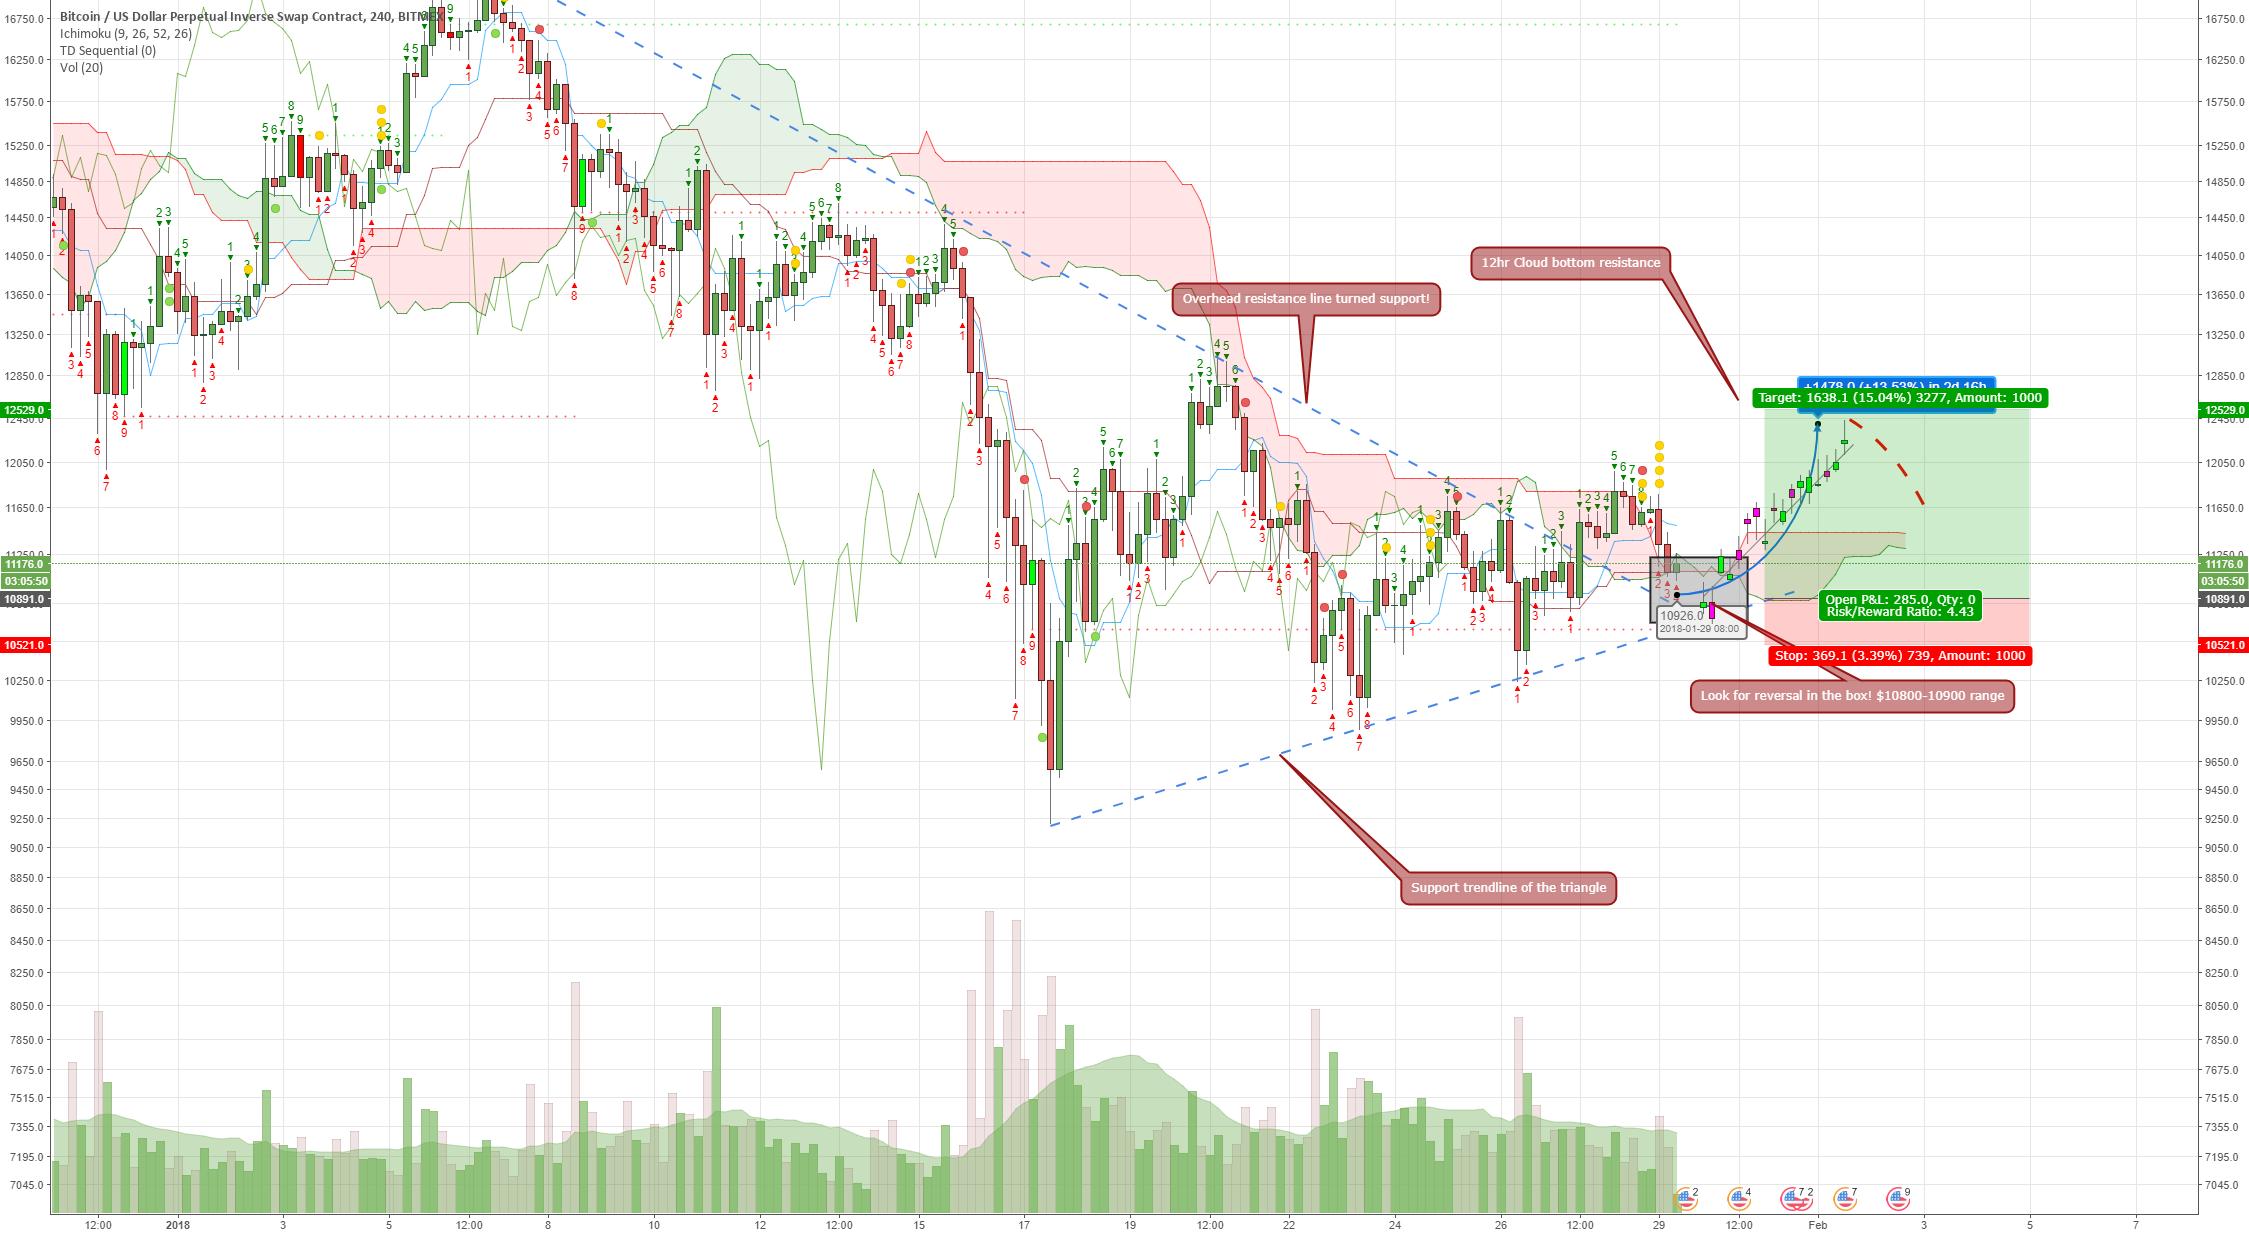 XBT Near Future Price movement